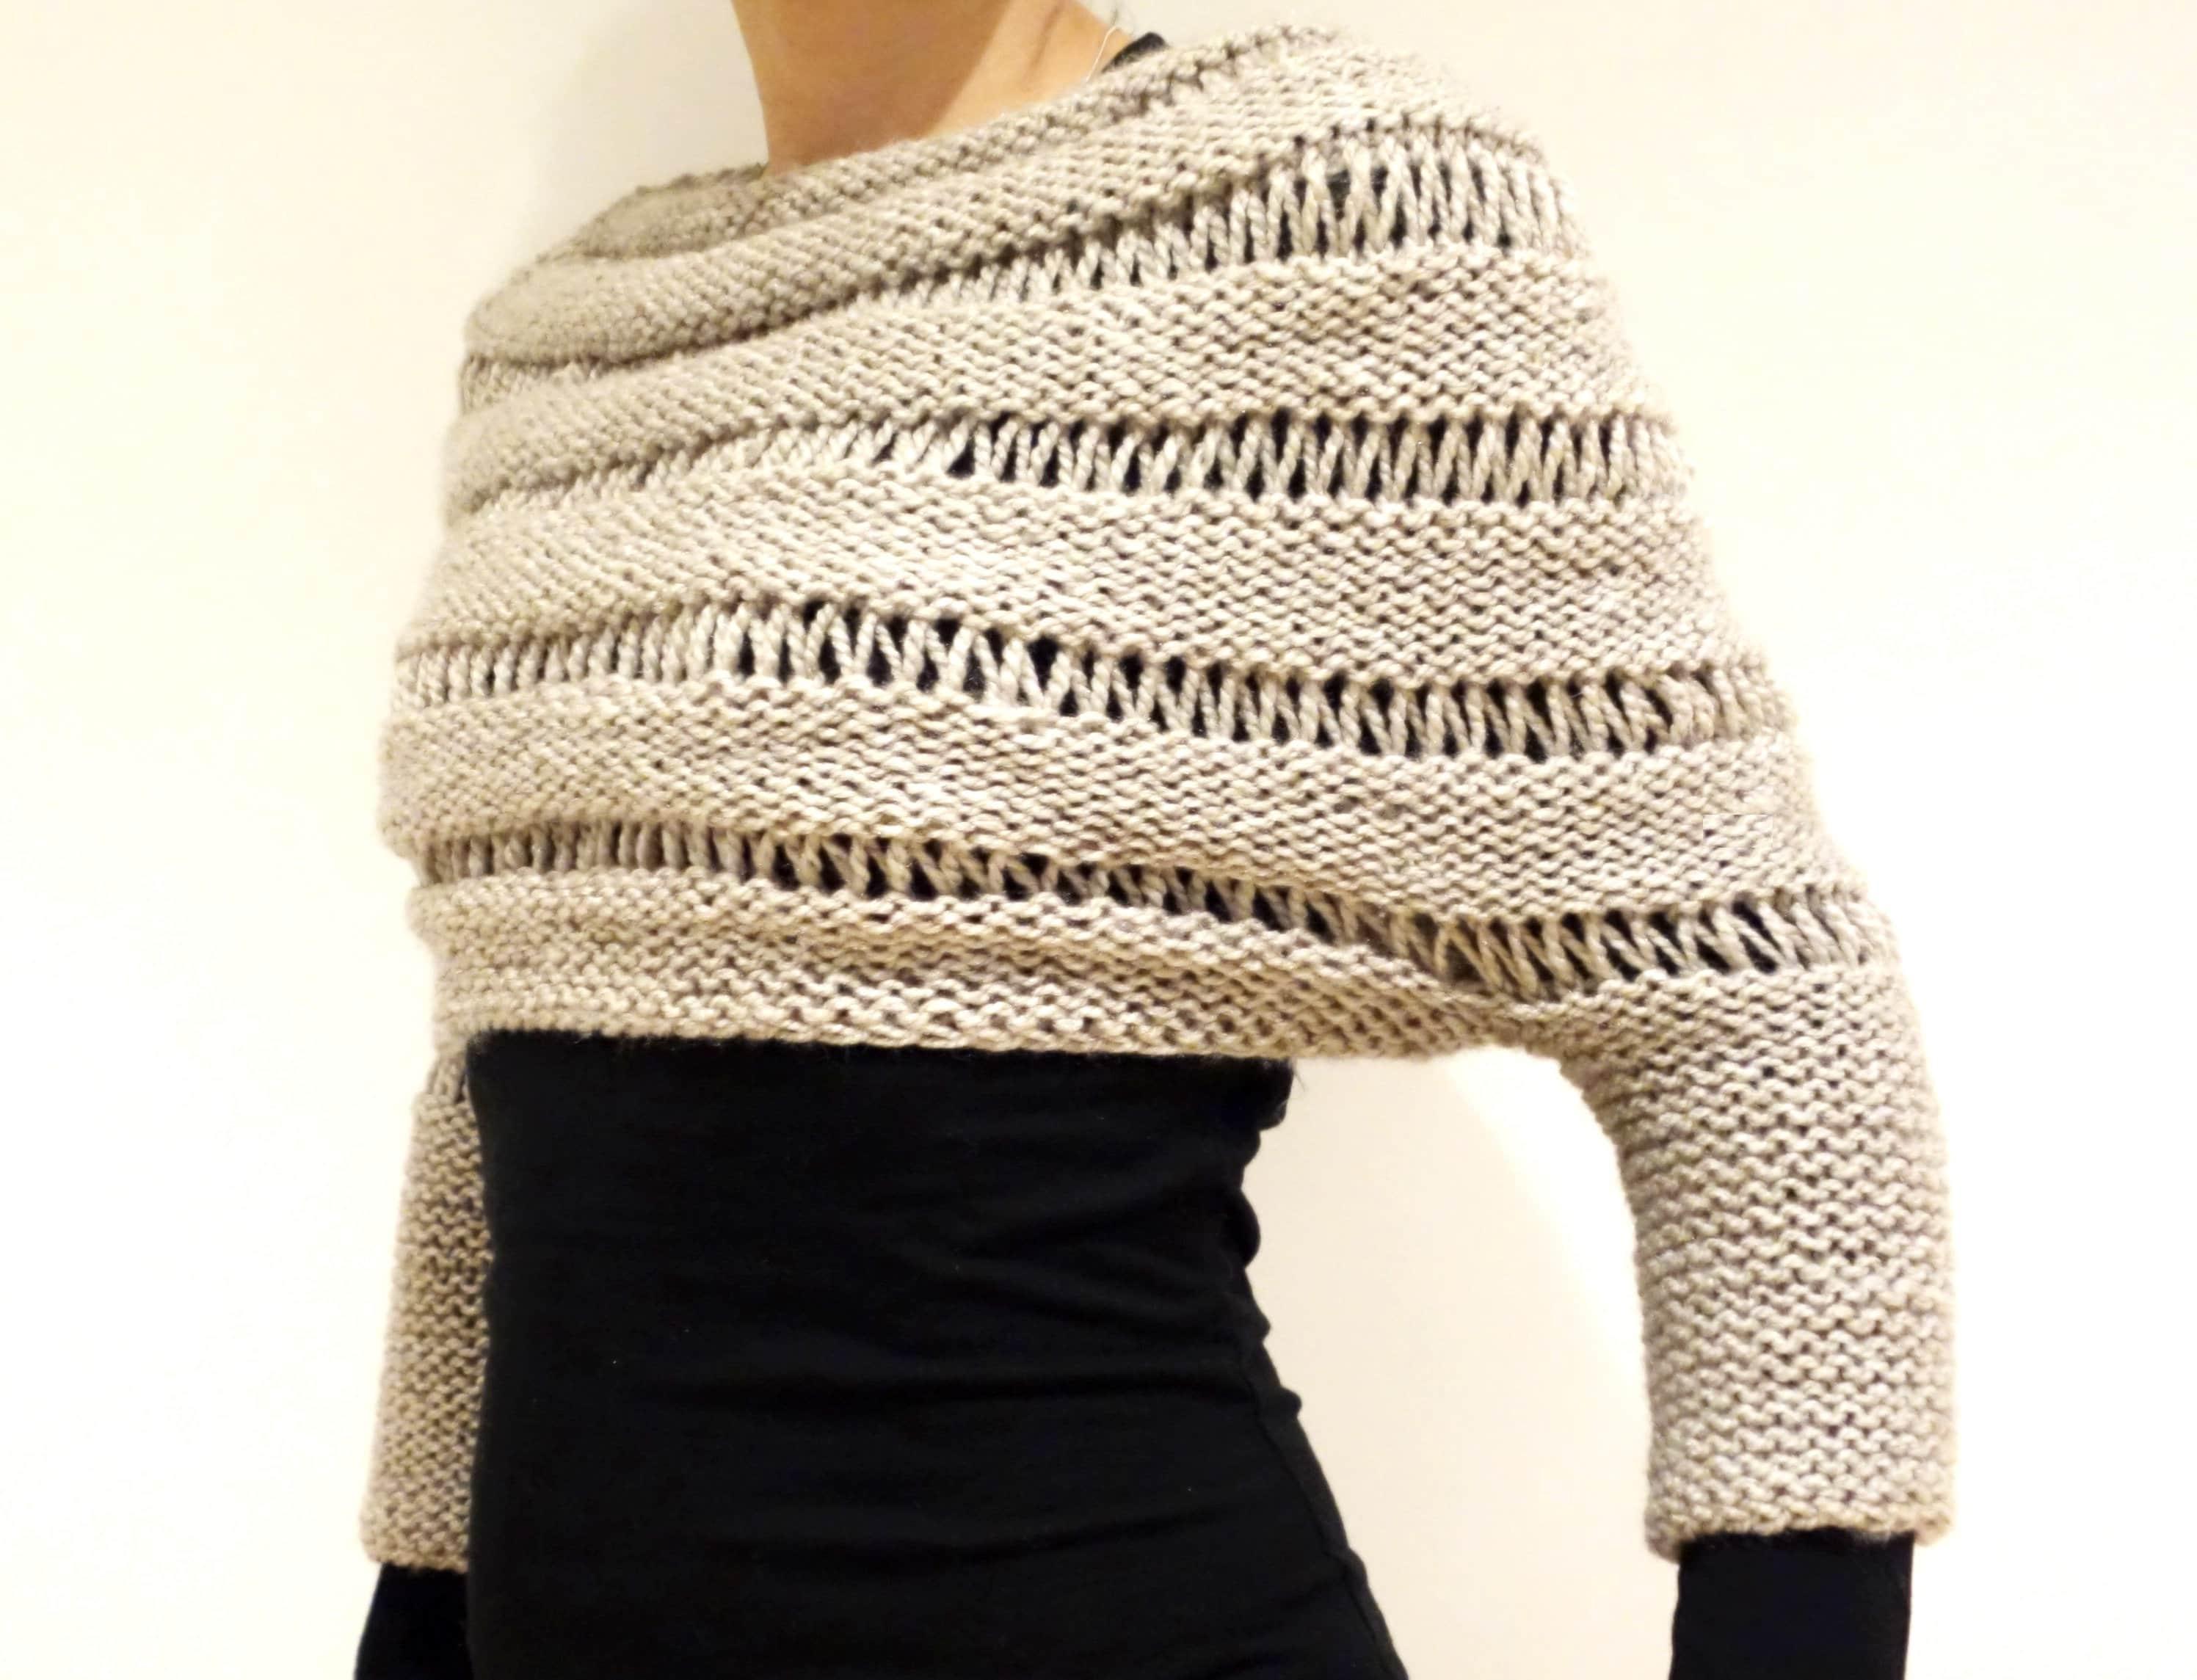 d845fabb6 Sweater Knitting PATTERN London Mist Cropped Sweater